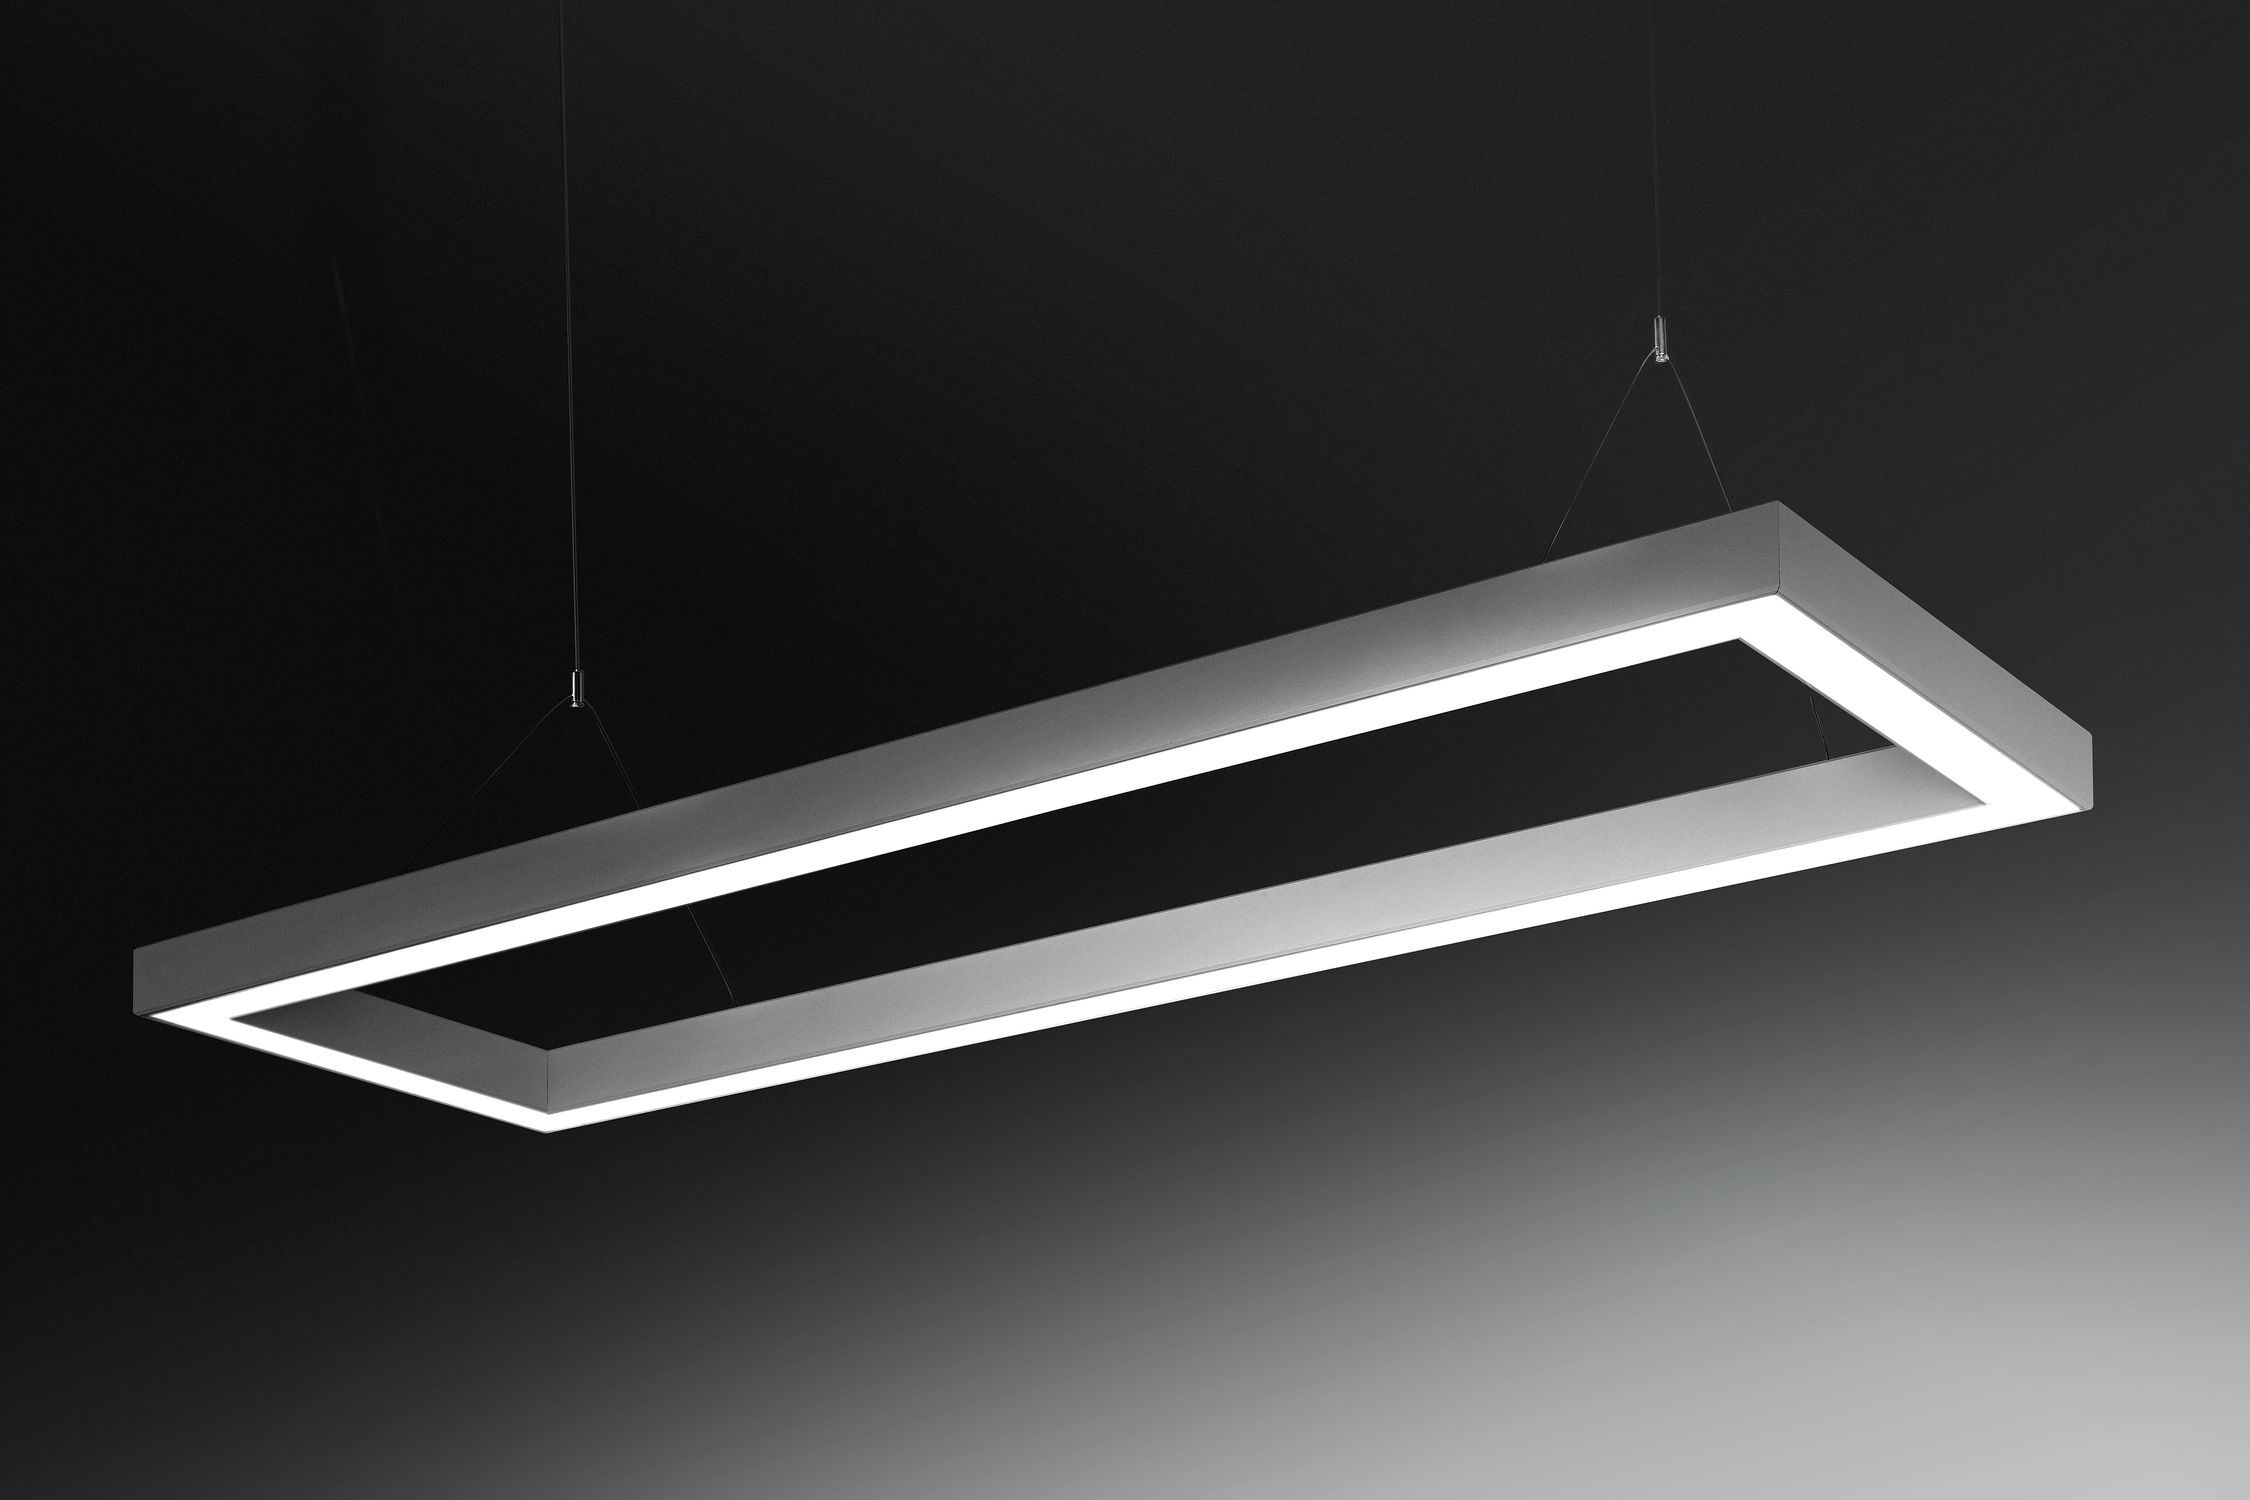 ... Hanging light fixture / LED / square / rectangular DINAMICA Q PLEXIFORM